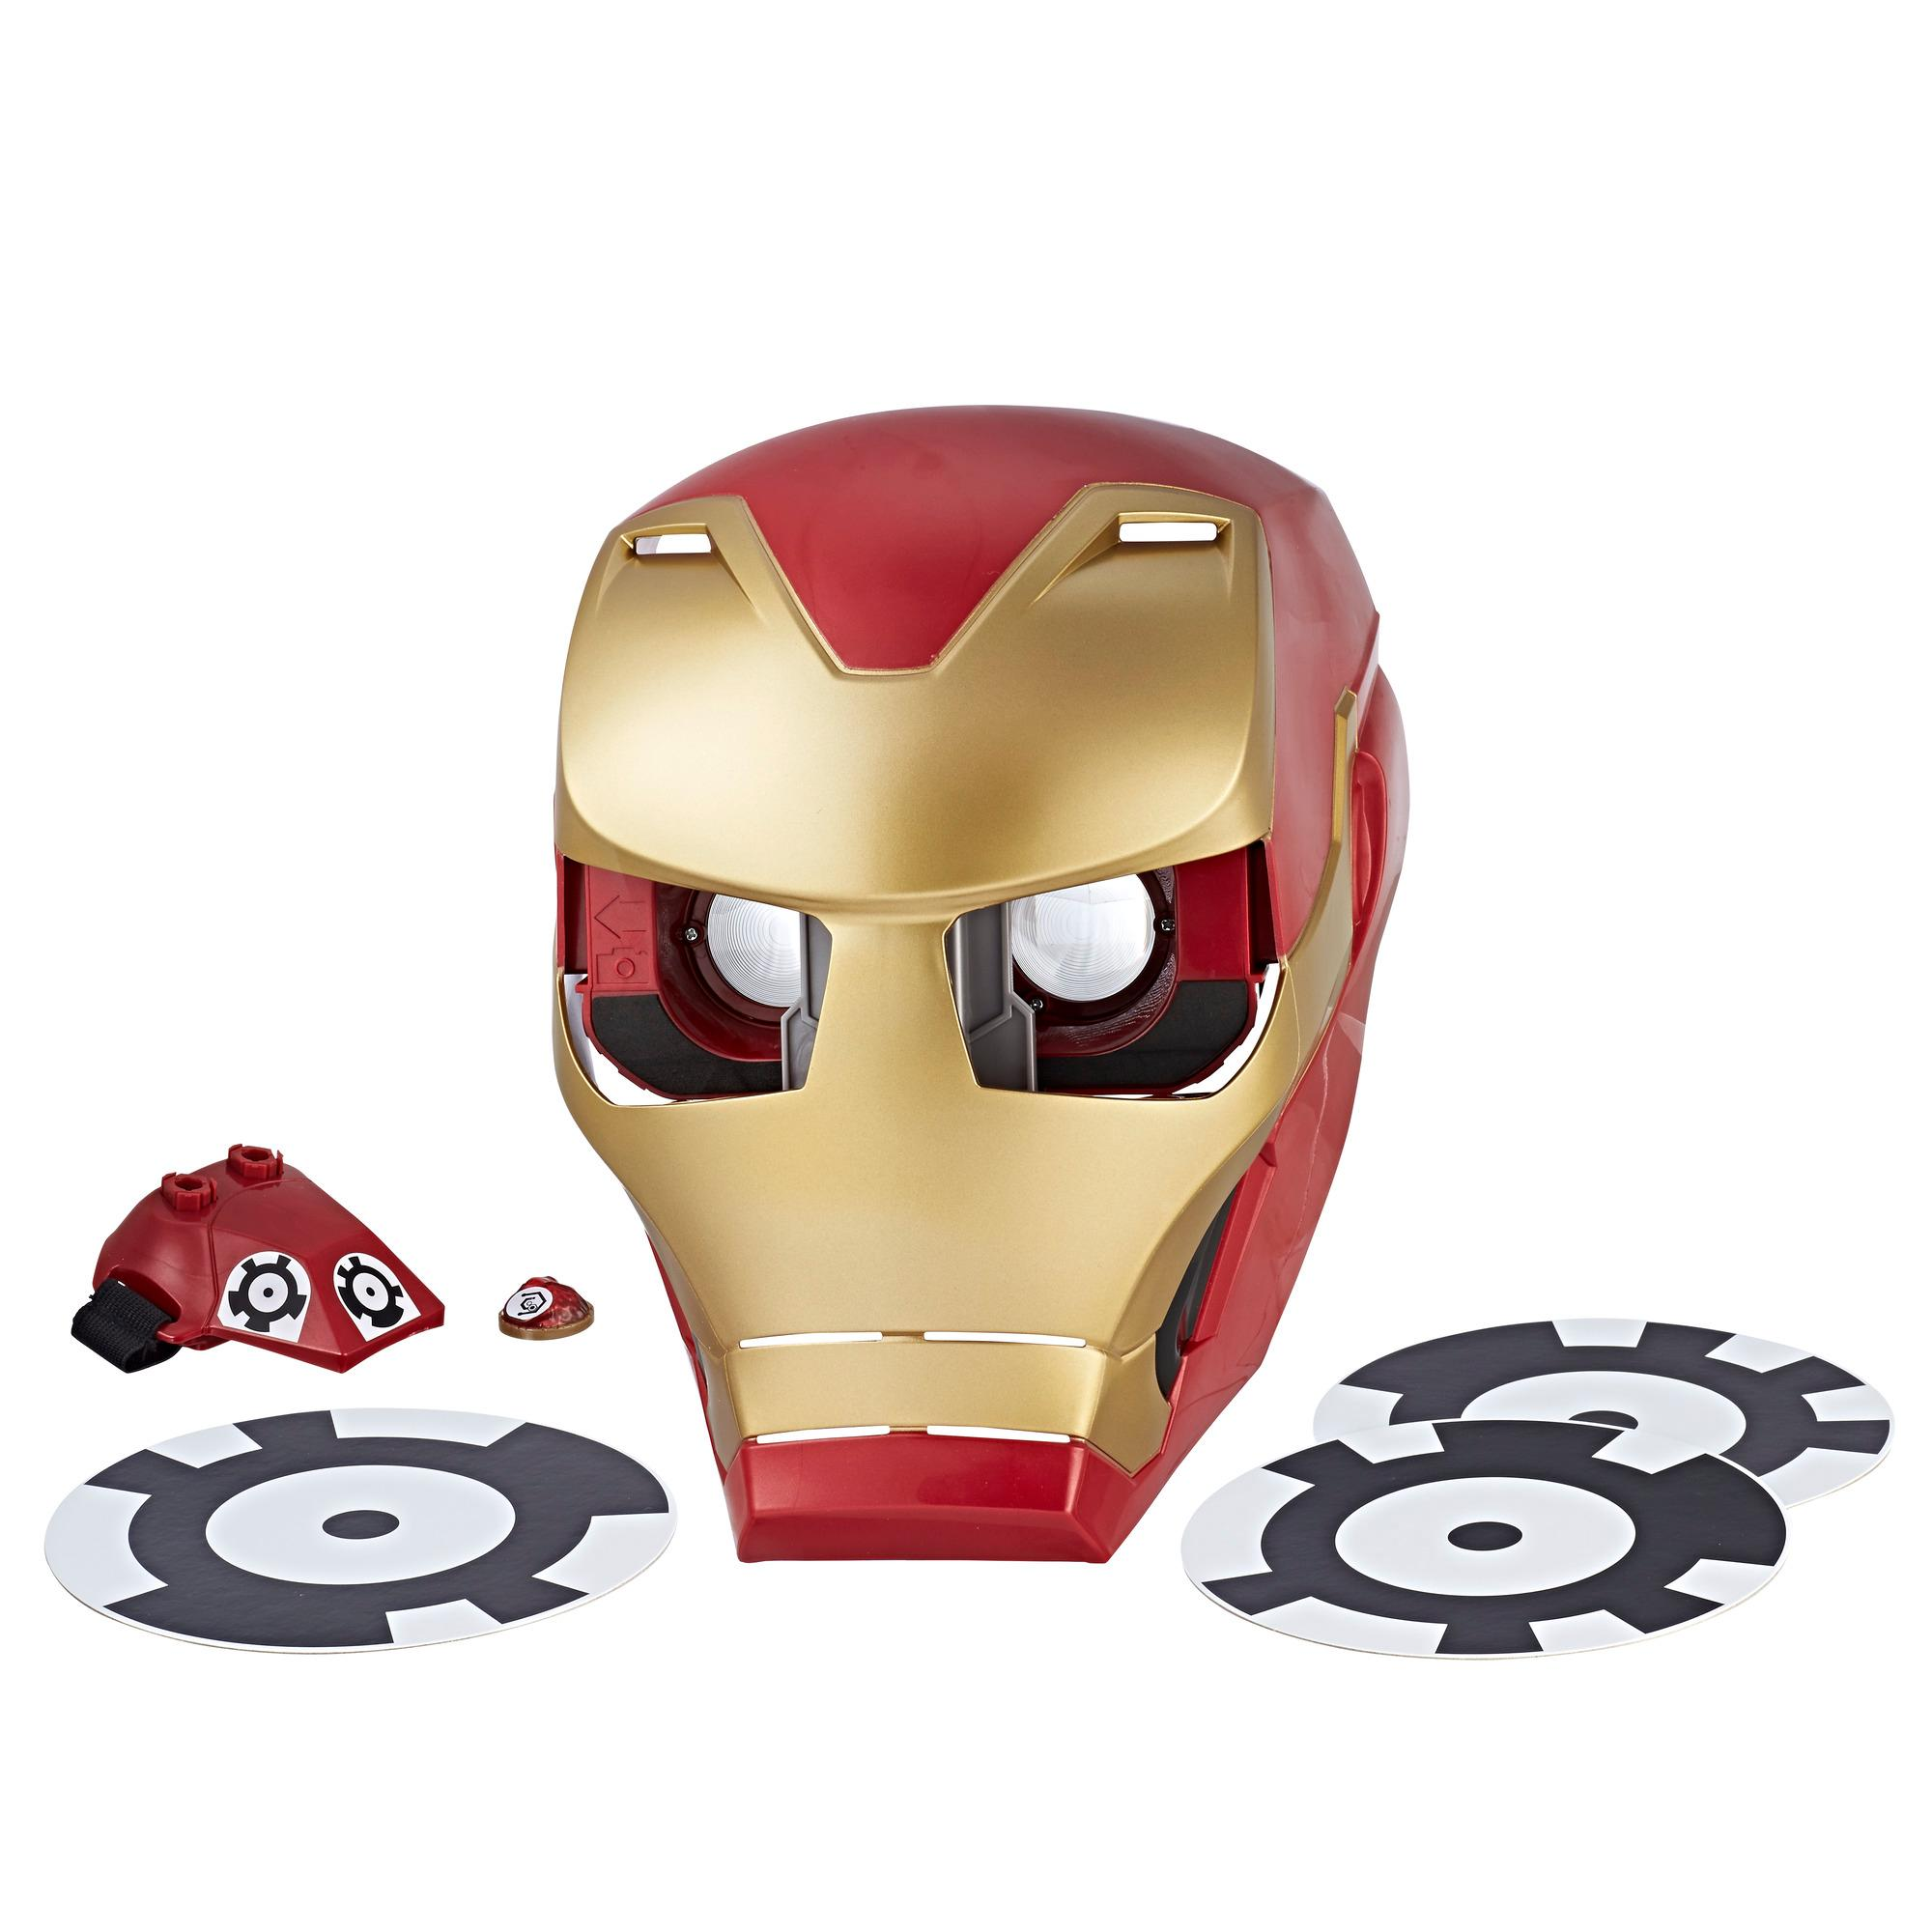 Avengers: Infinity War Hero Vision Iron Man AR Maskesi